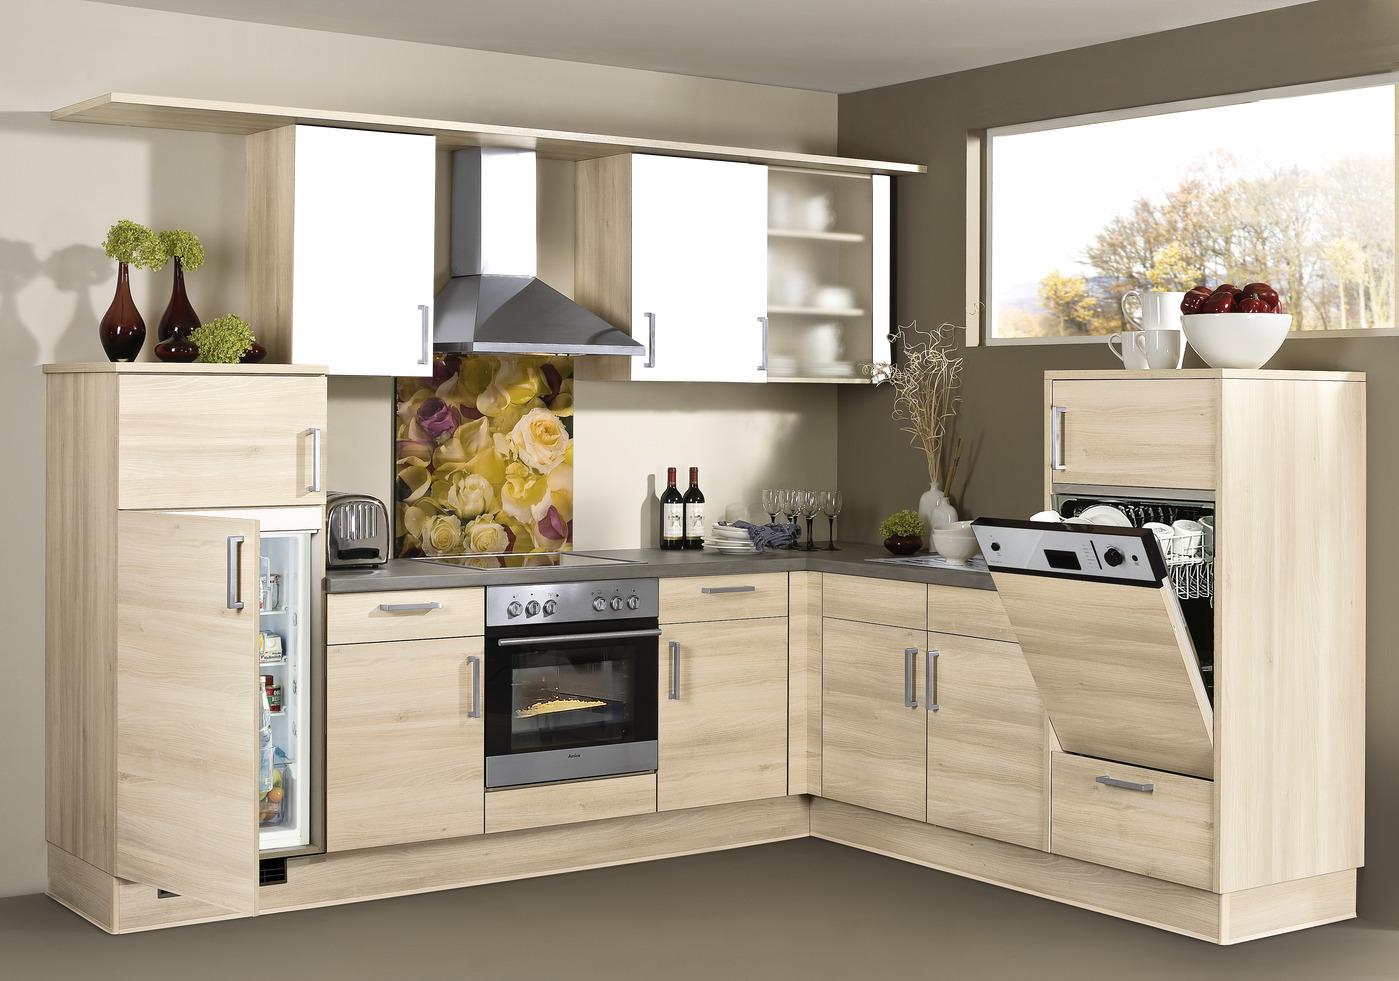 L-Küche in Holzoptik